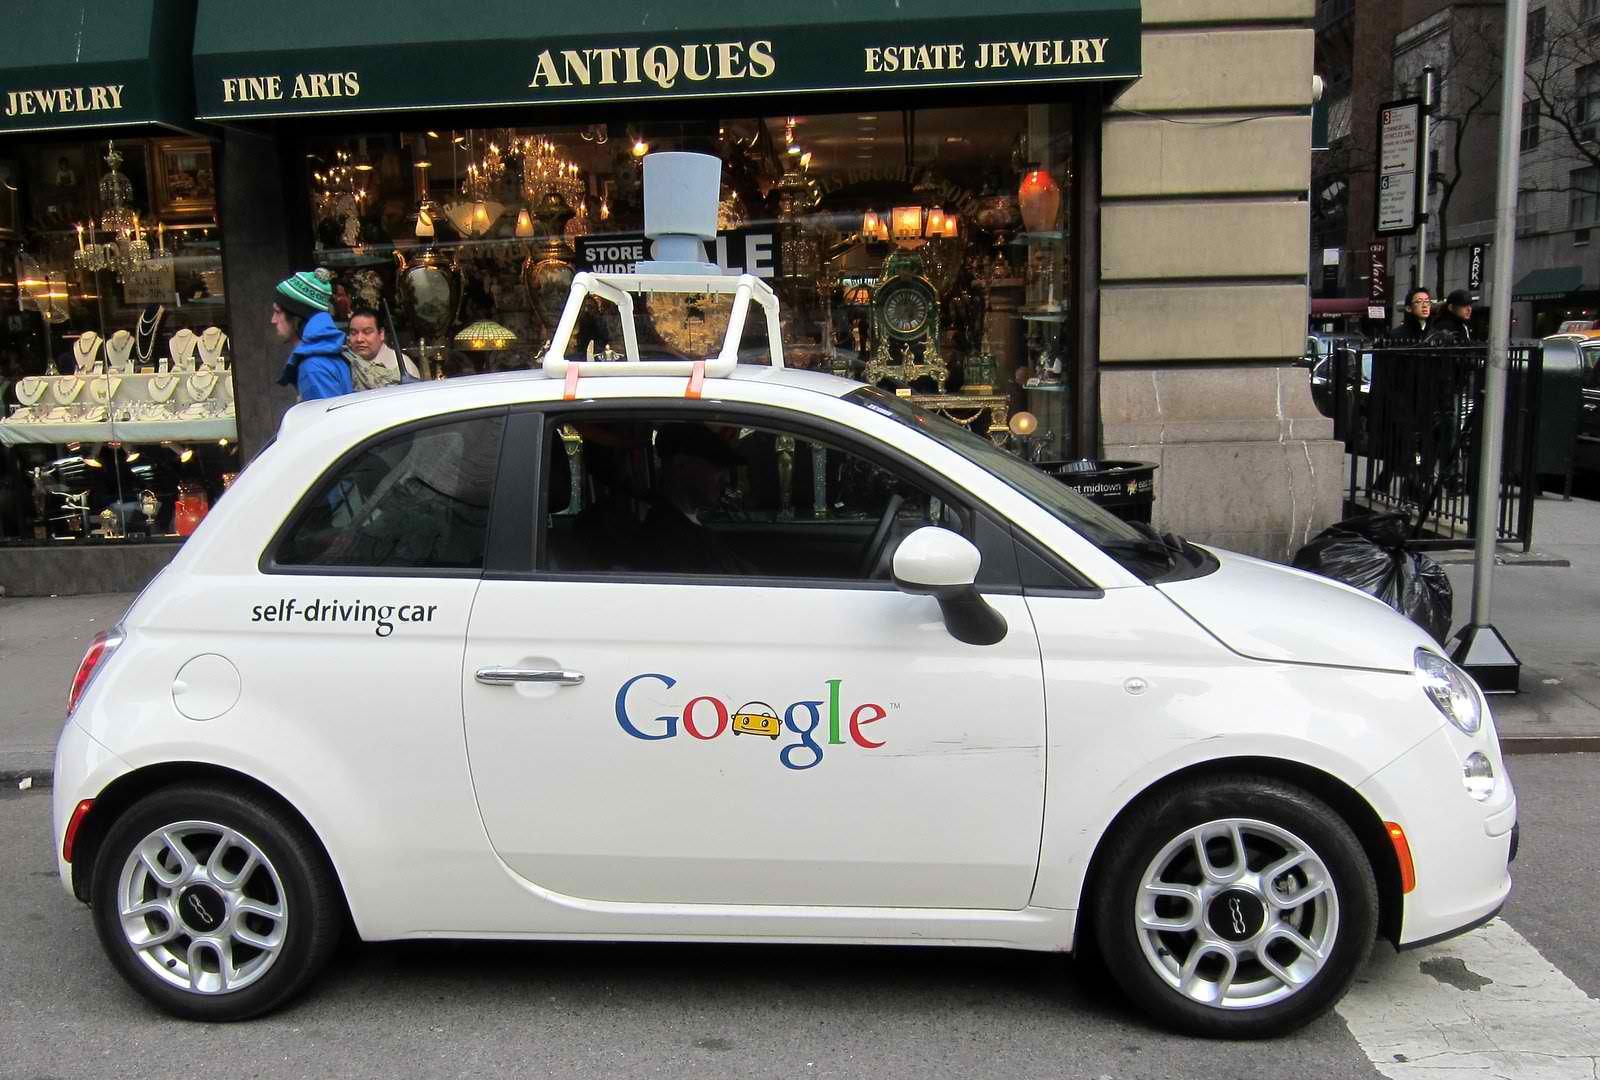 Masina fara sofer a Google a fost implicata in al 13-lea accident din anul 2009